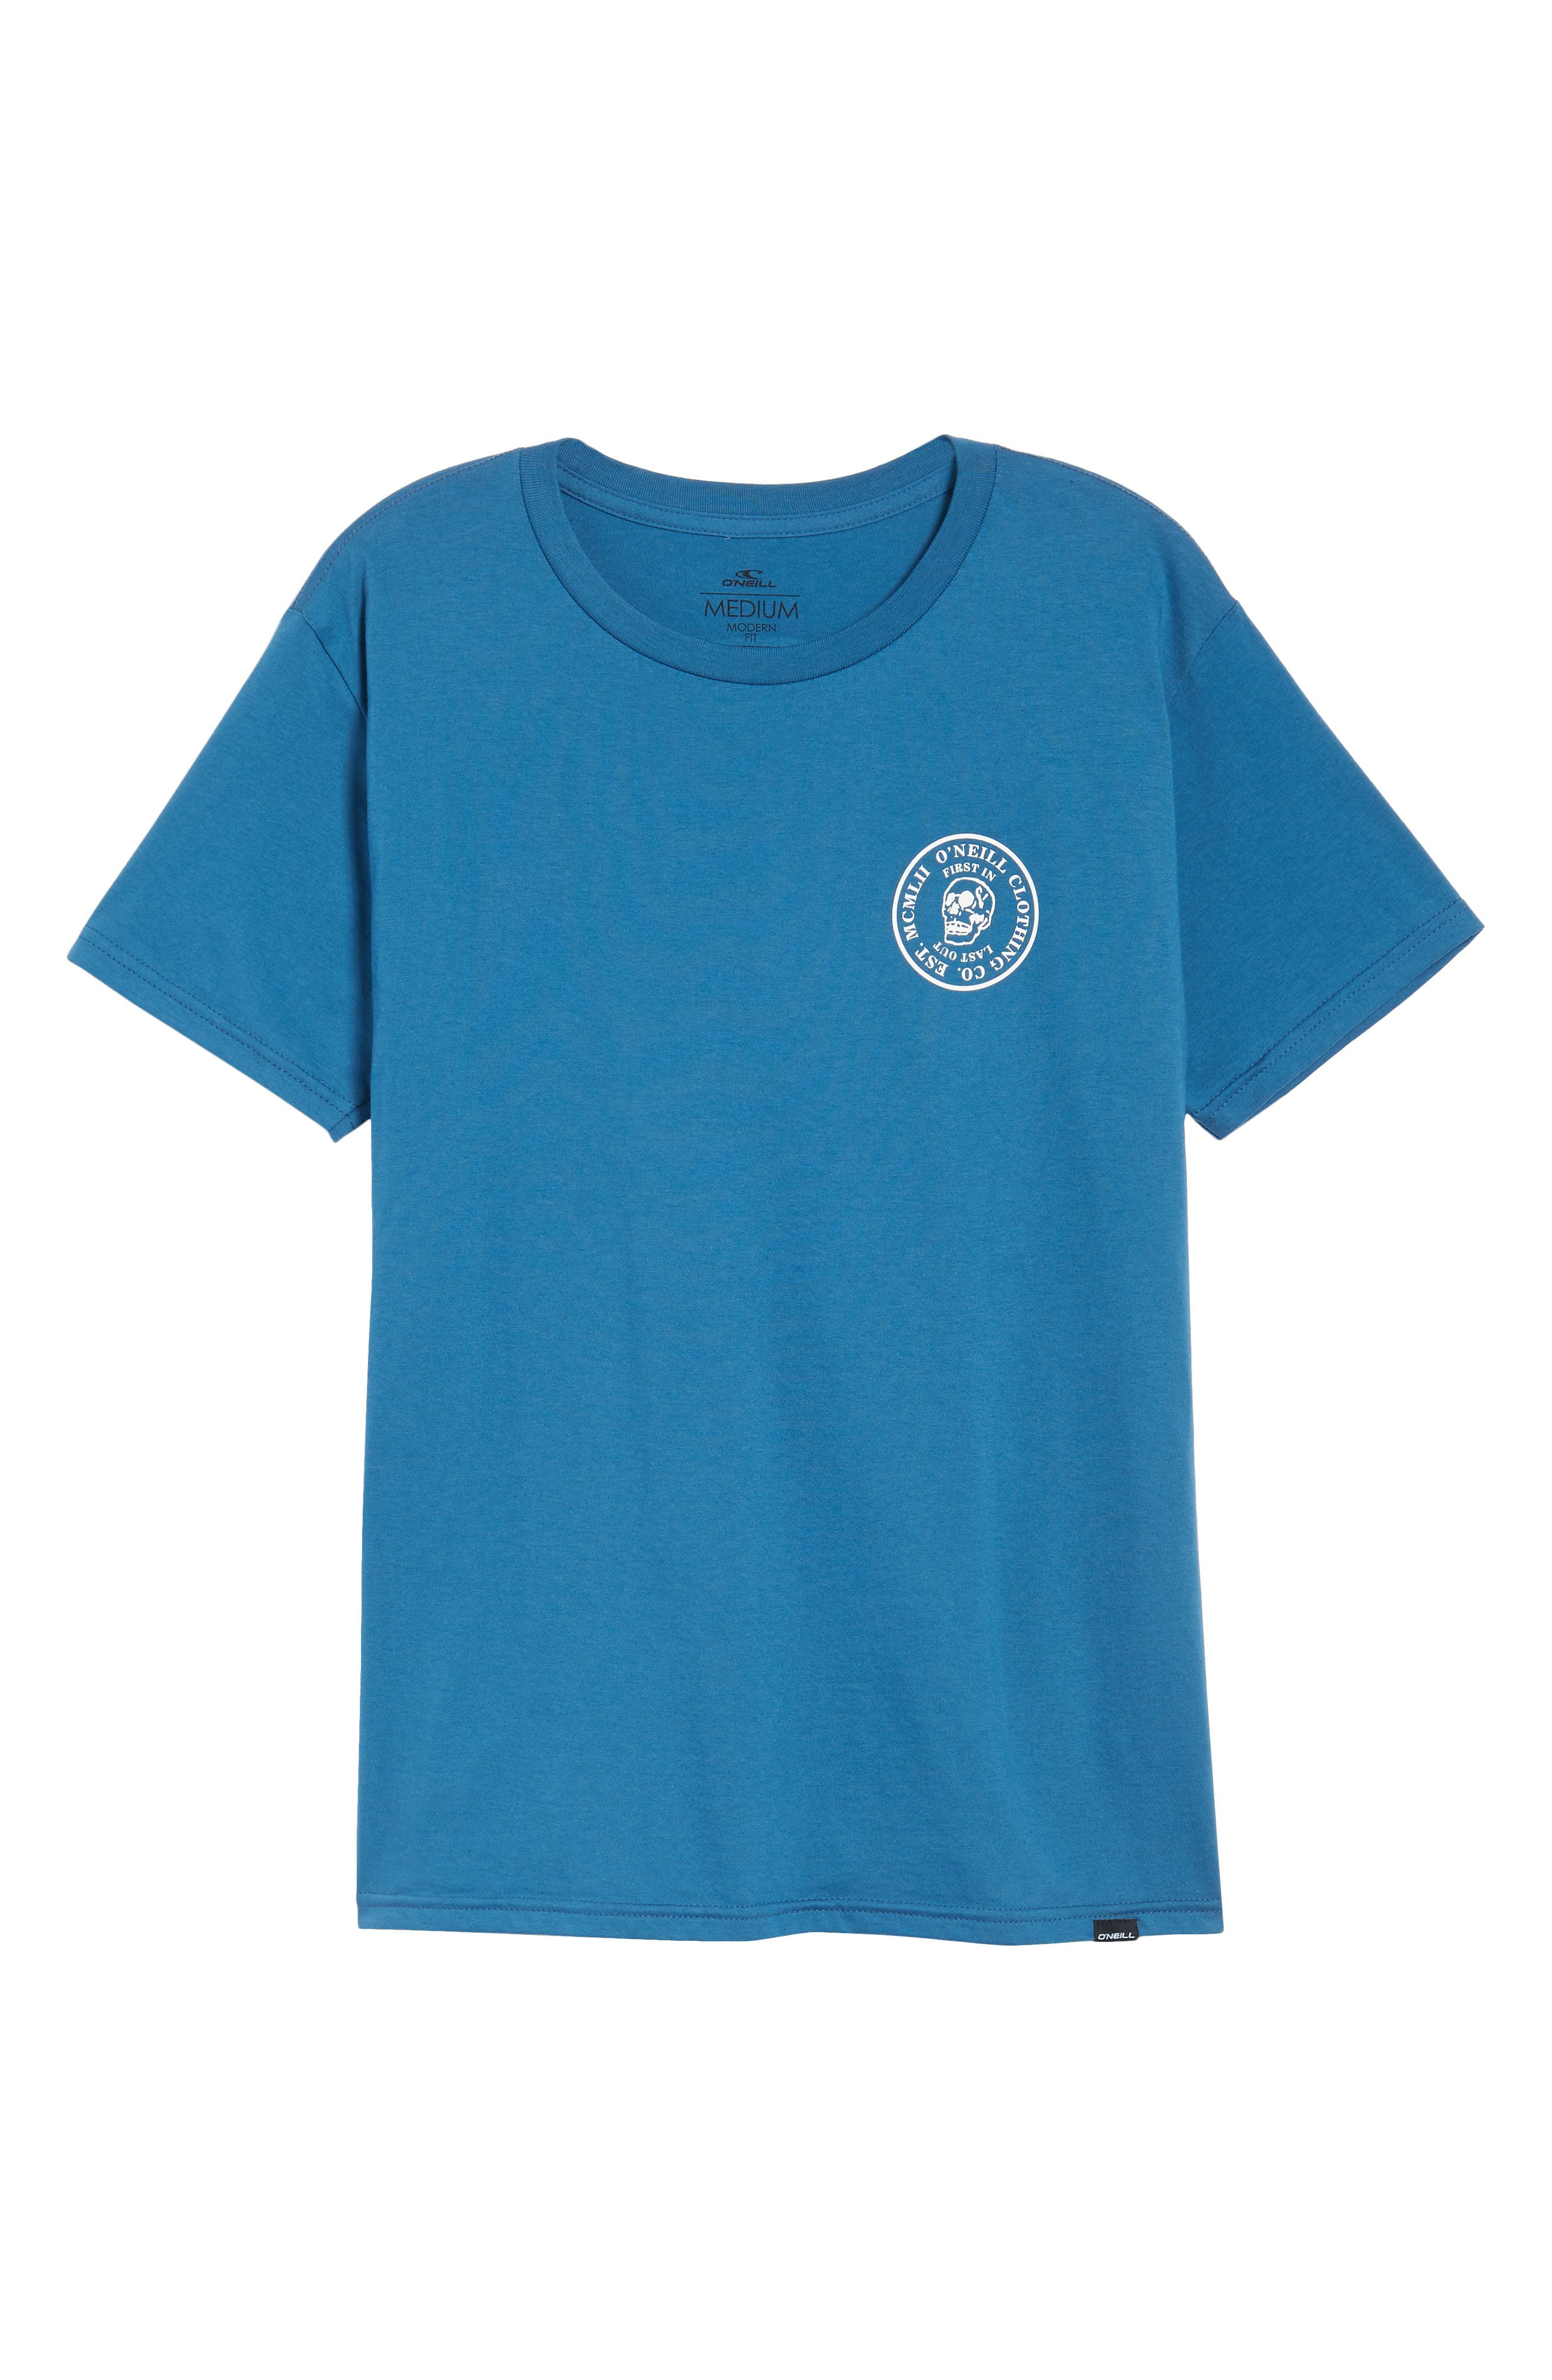 Skully Graphic T-Shirt,                             Alternate thumbnail 6, color,                             400